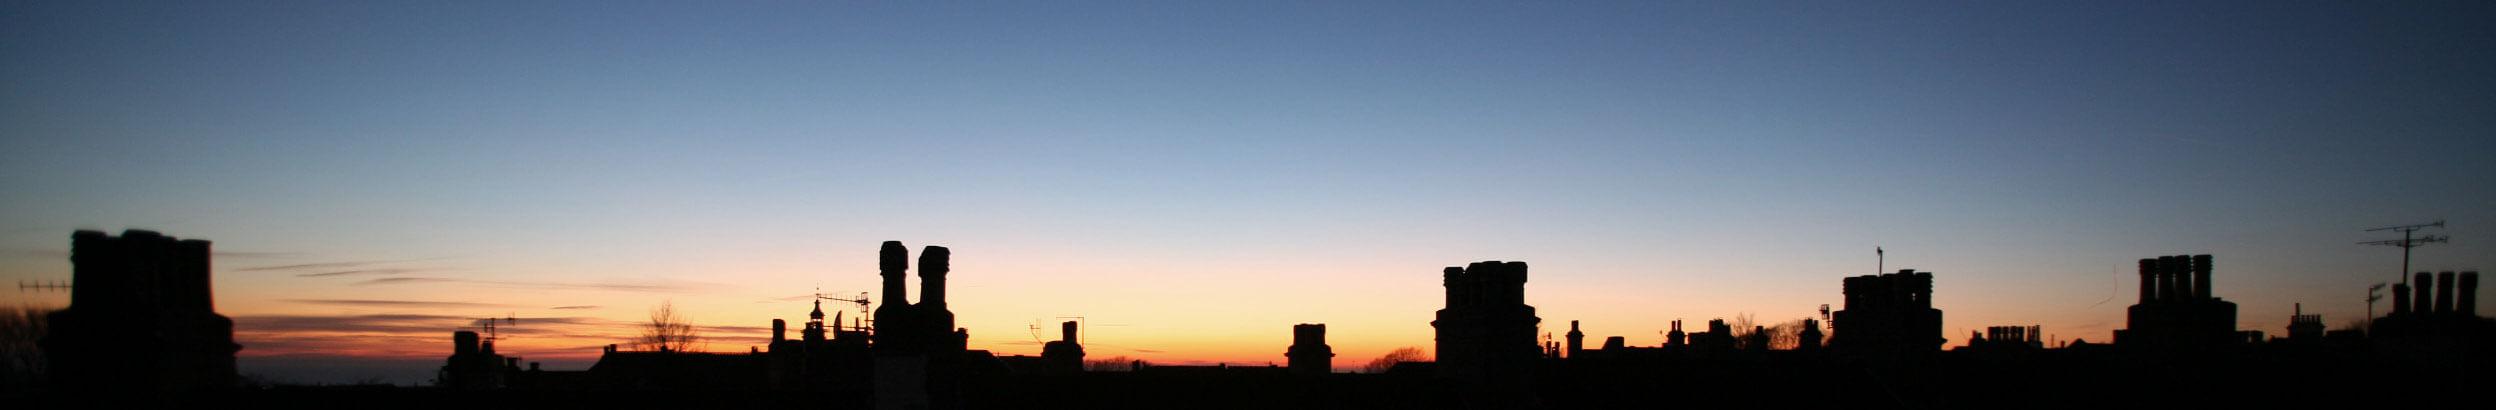 brighton-skyline